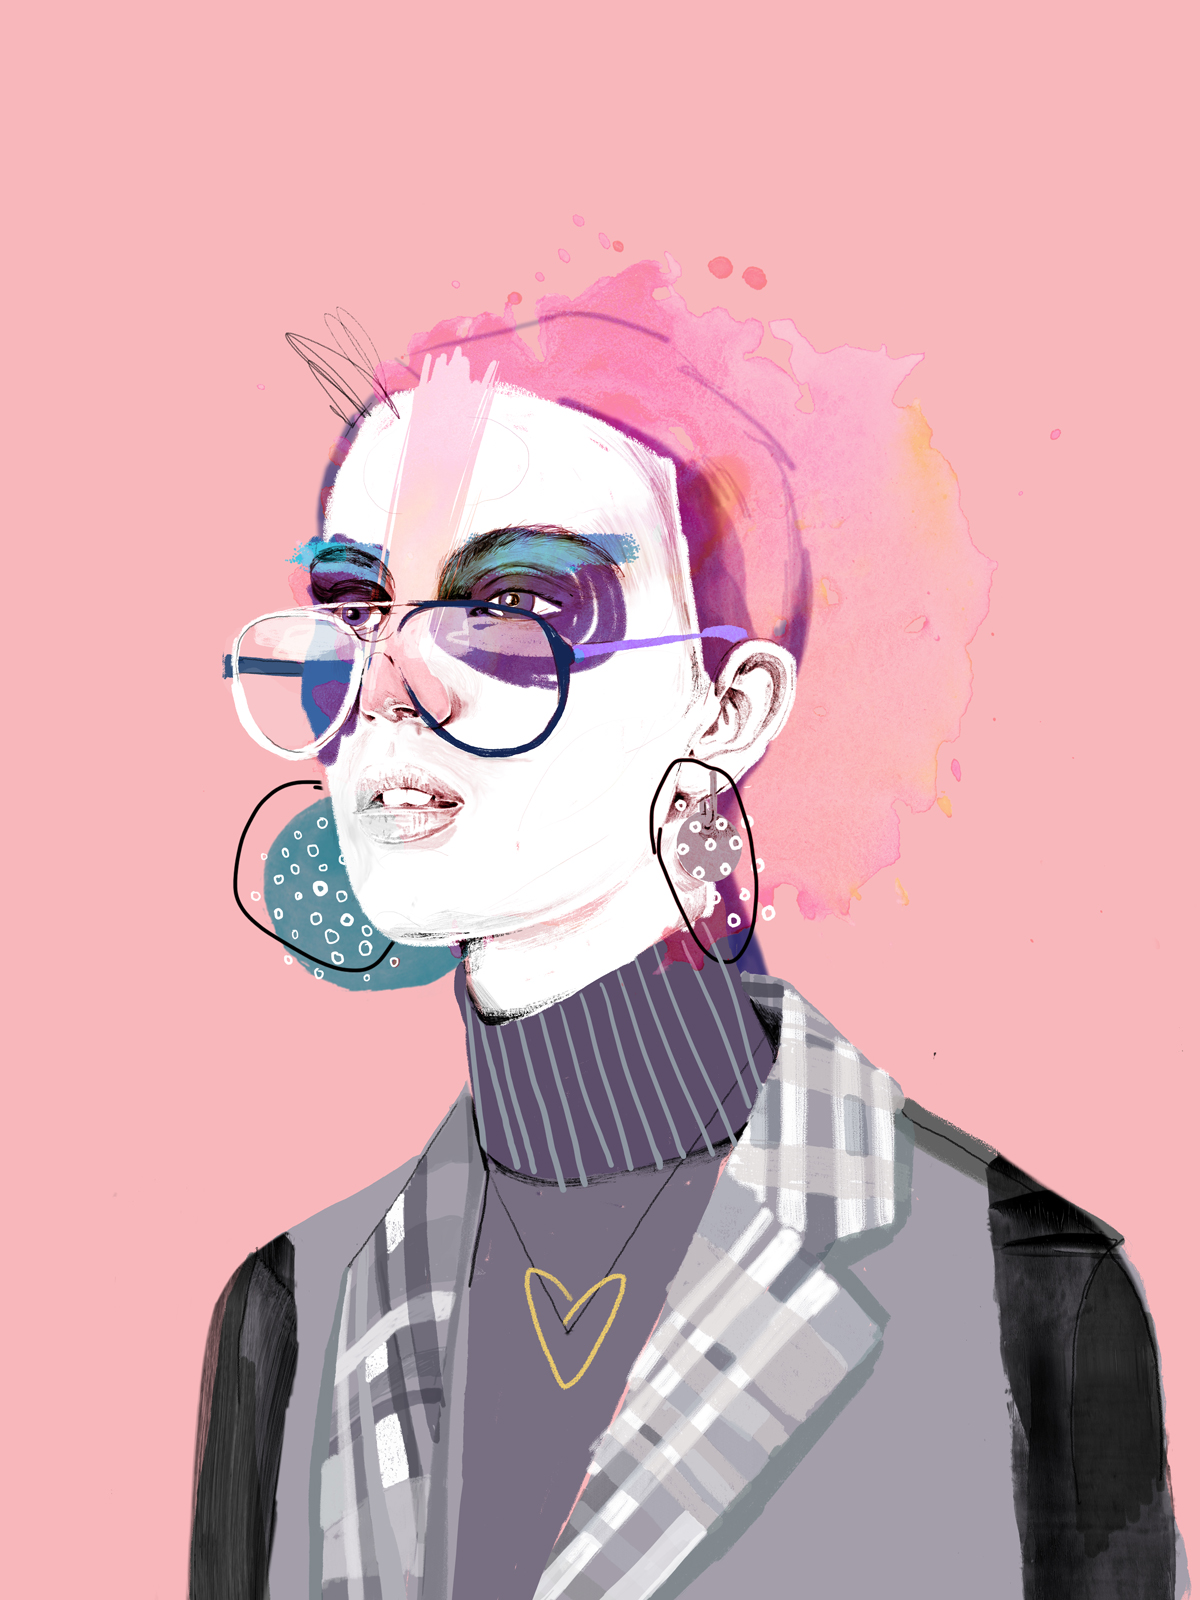 Million_fashion_portrait_procreate_illustration.jpg